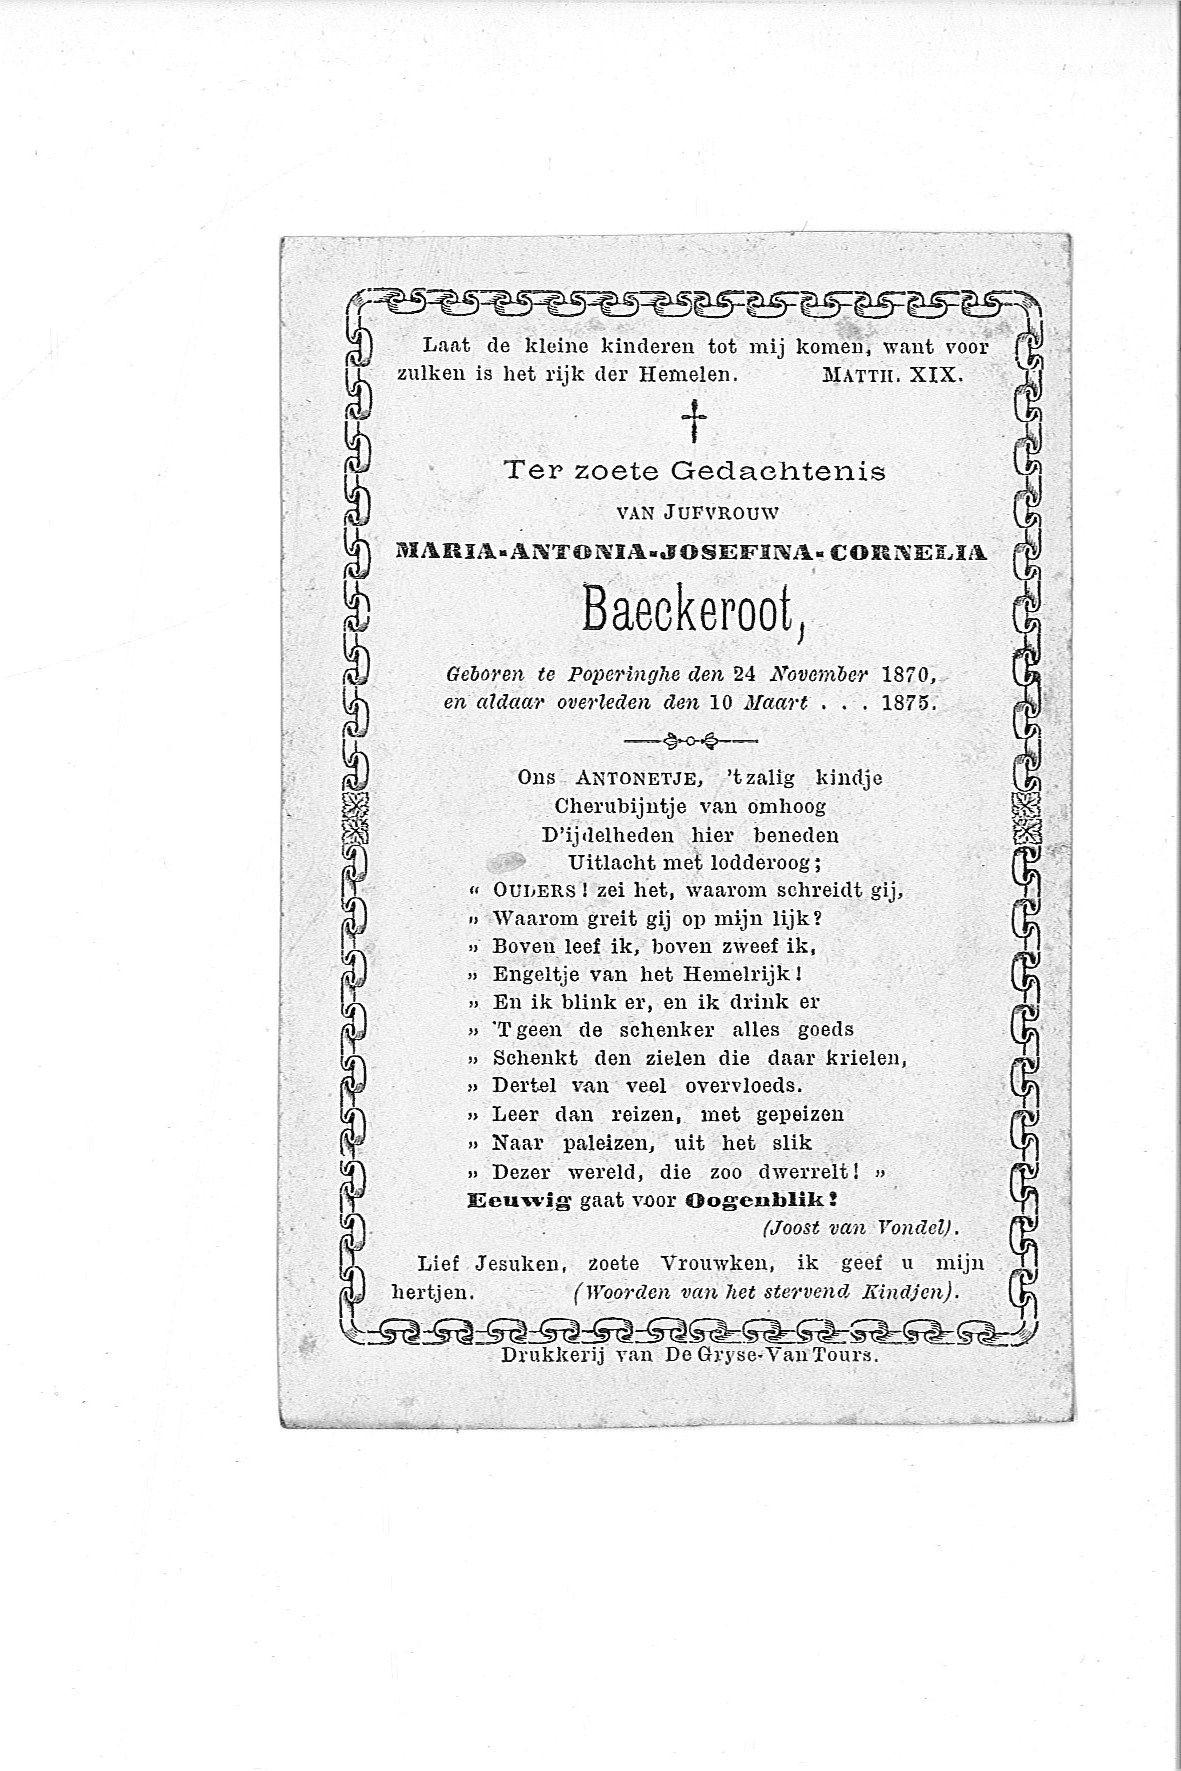 maria-antonia-josefina-cornelia(1876)20090430094548_00016.jpg